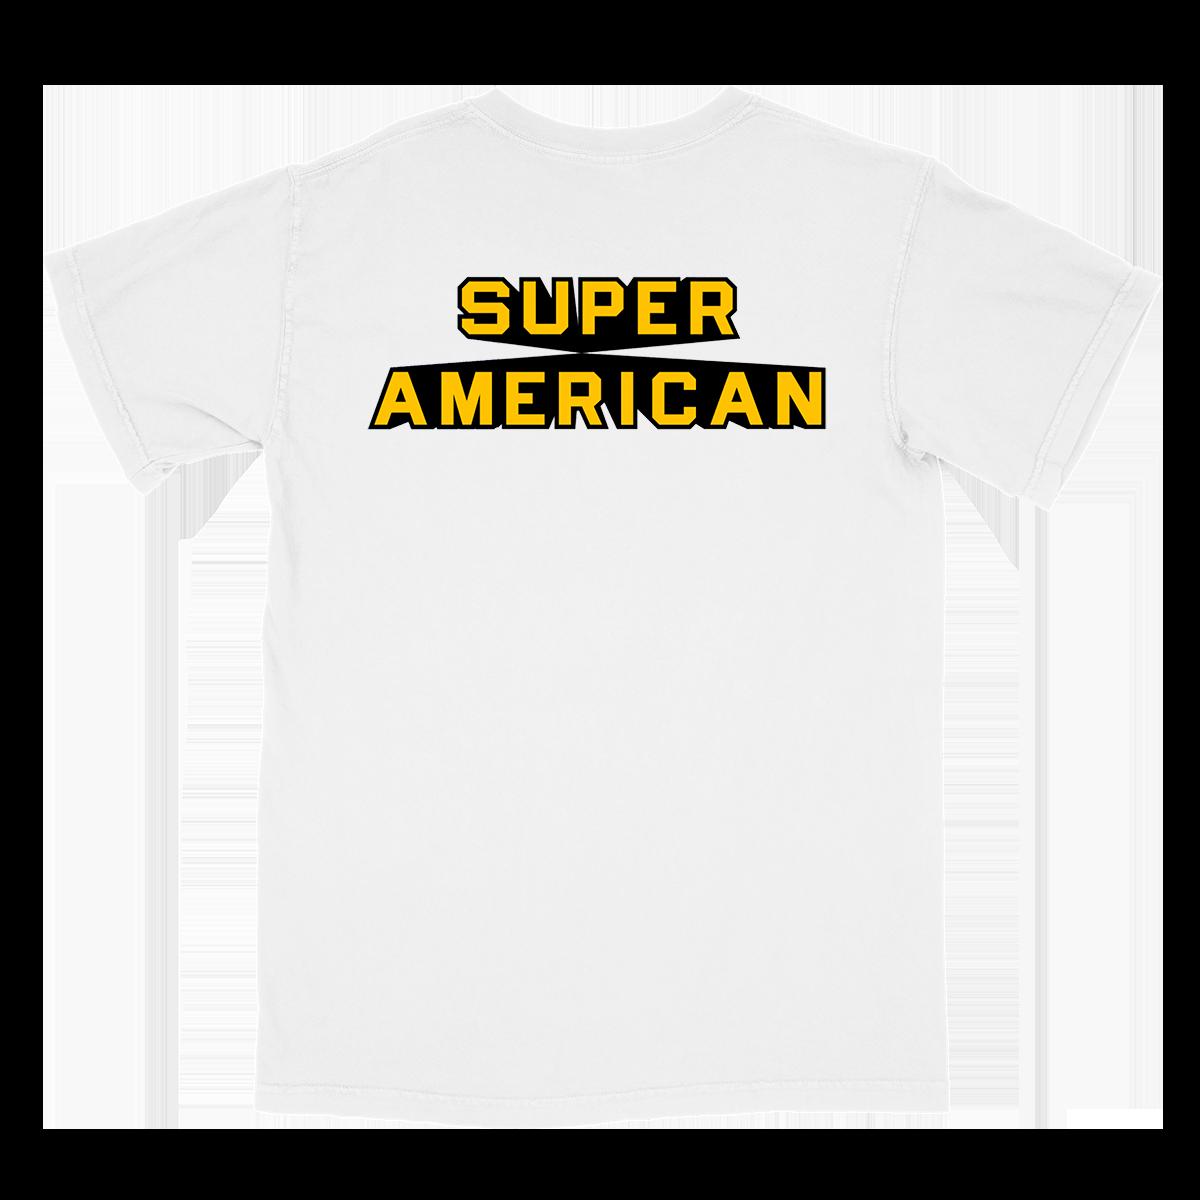 Super American -- Super American Free Bird Tee